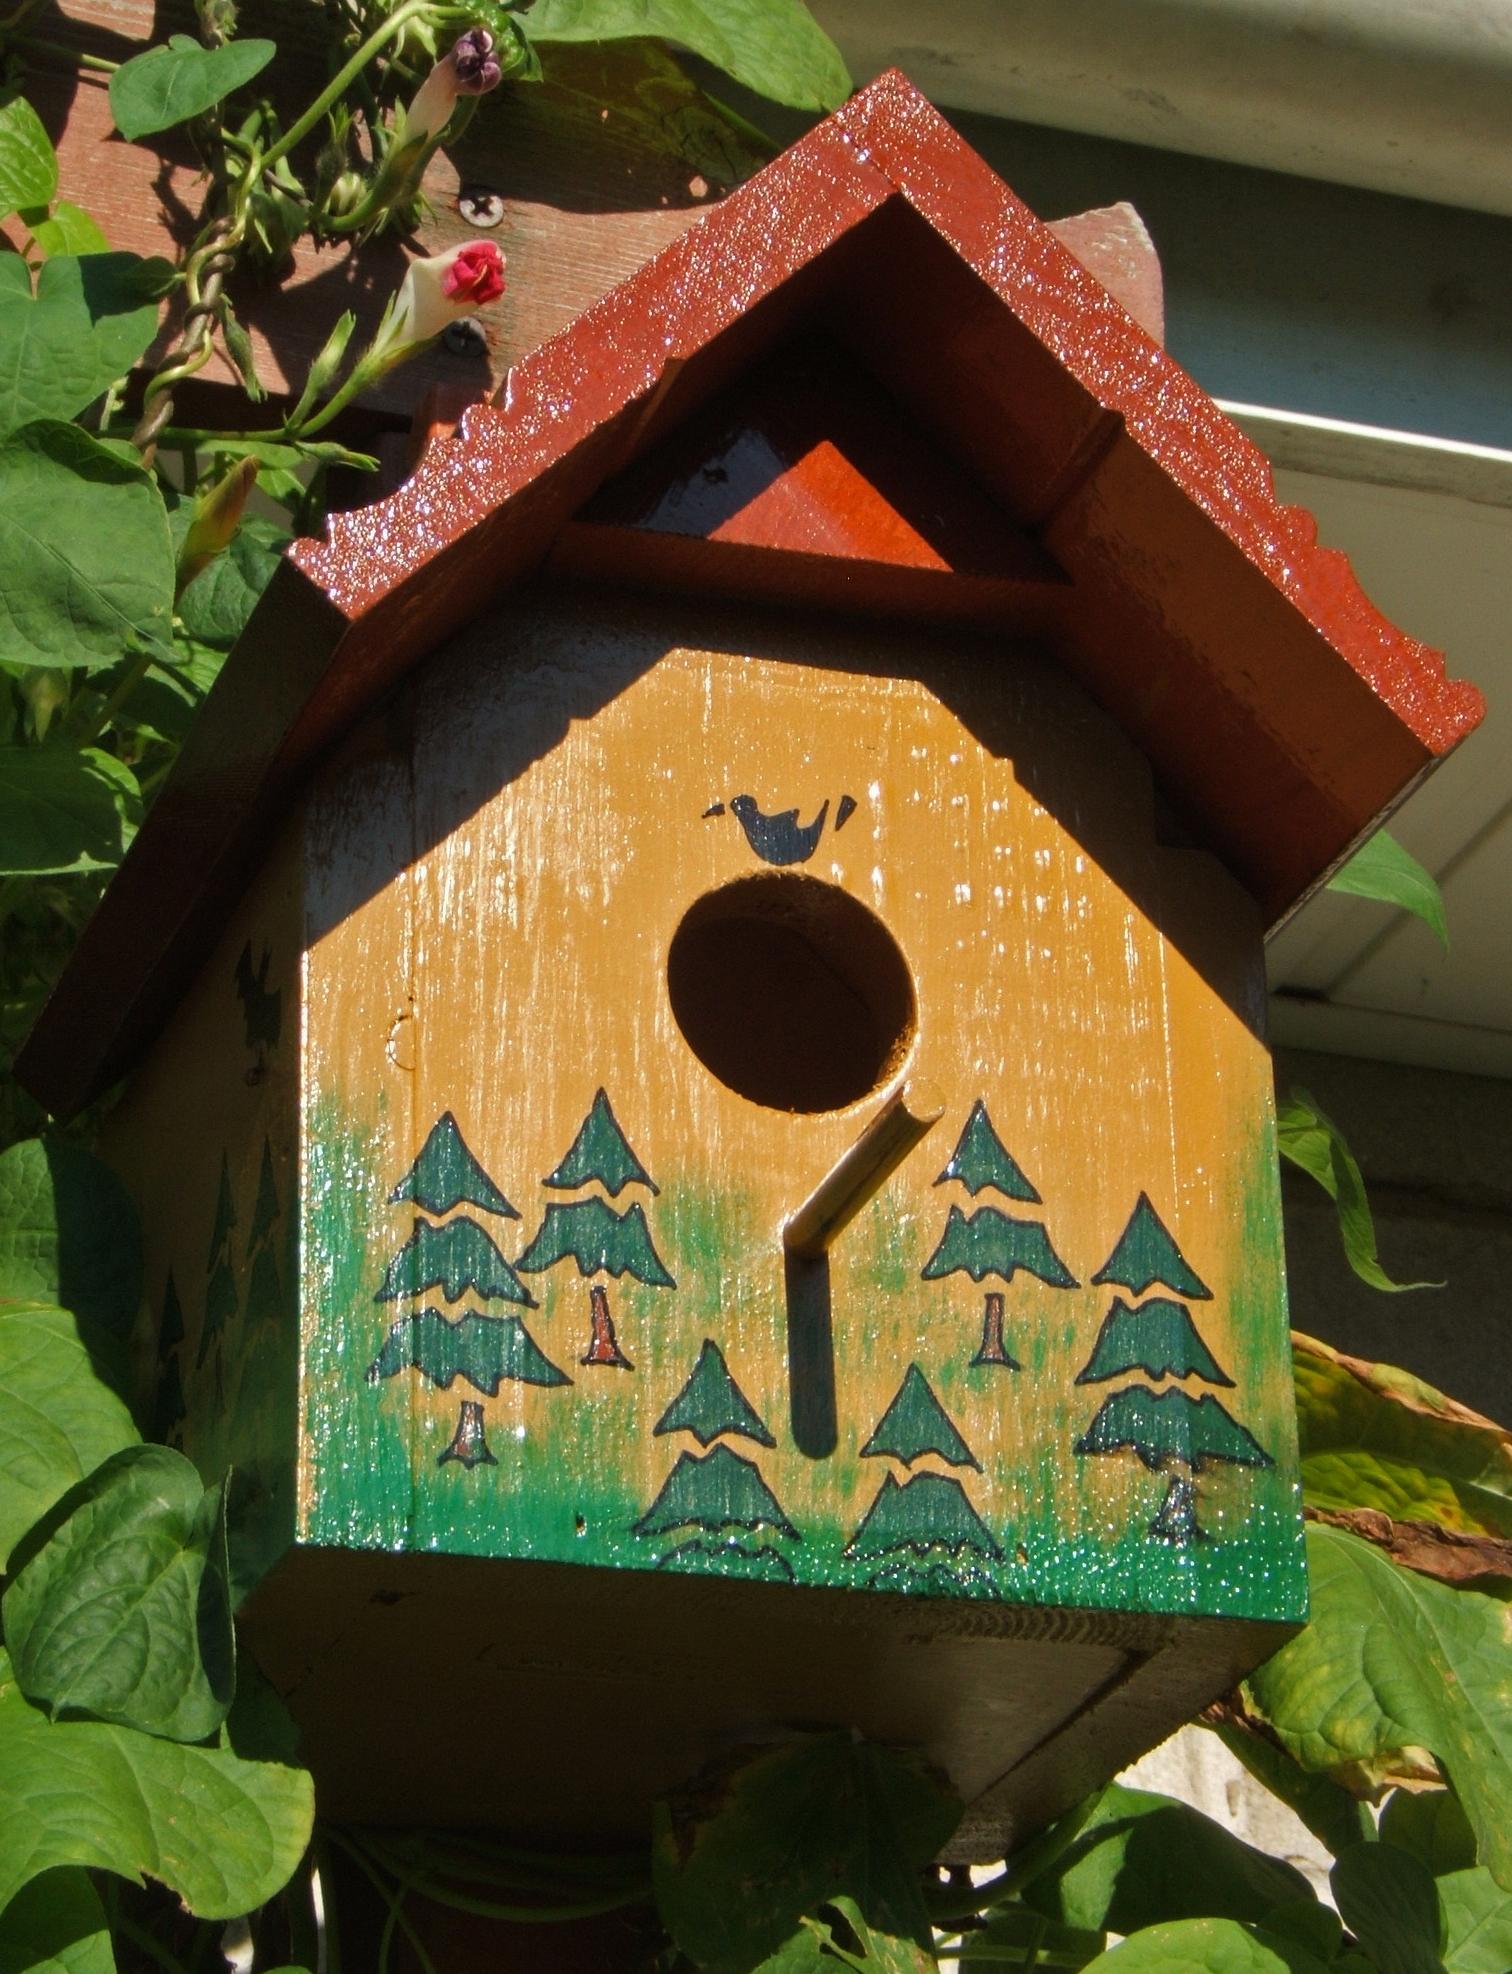 Woods Theme Bird House 1 of 2.jpg